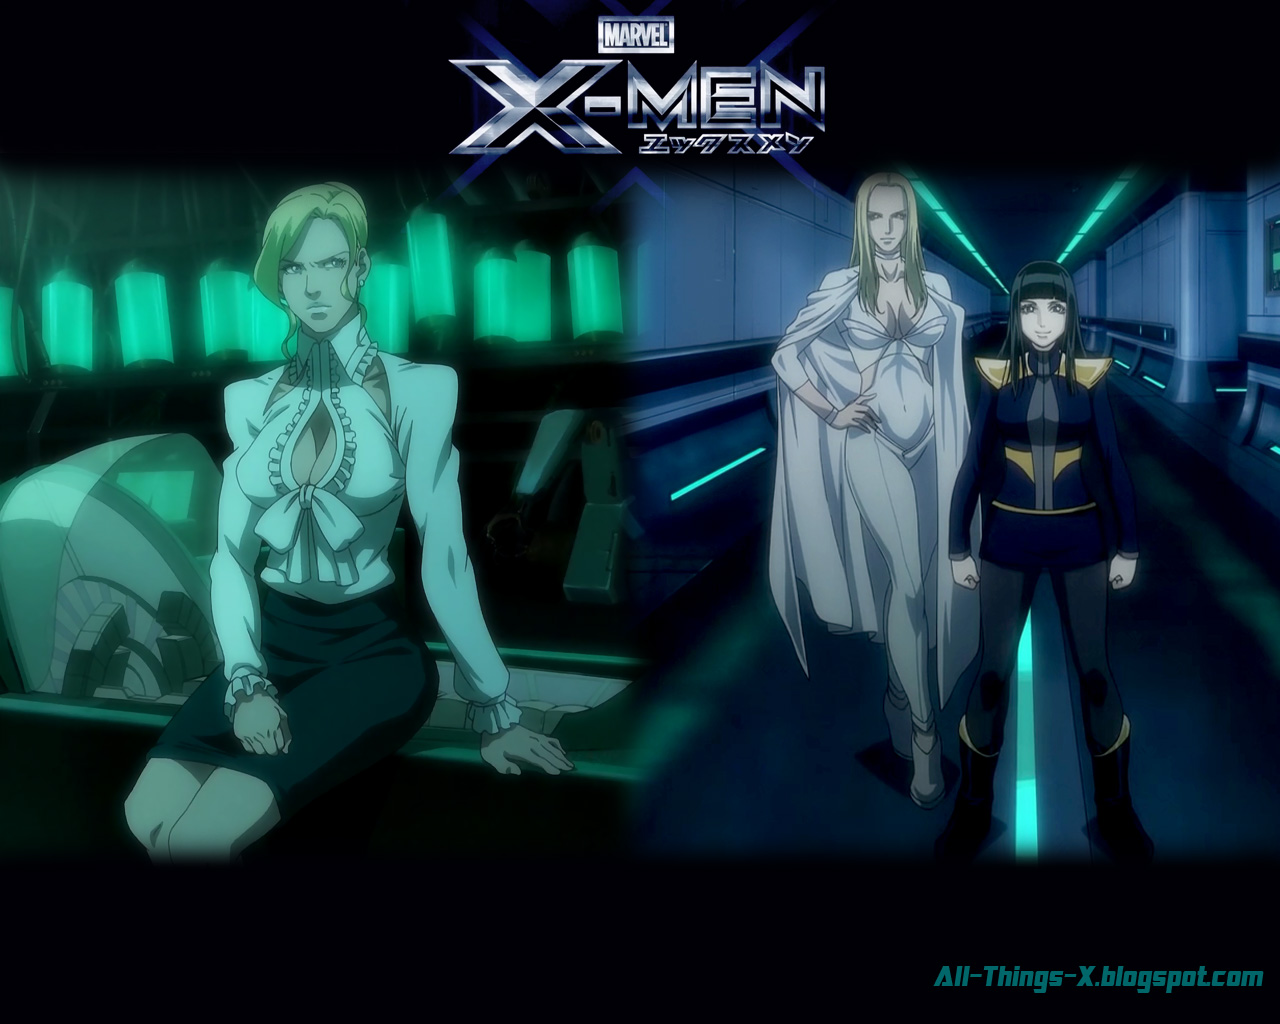 Wolverine X Men Anime Screens Concept Art